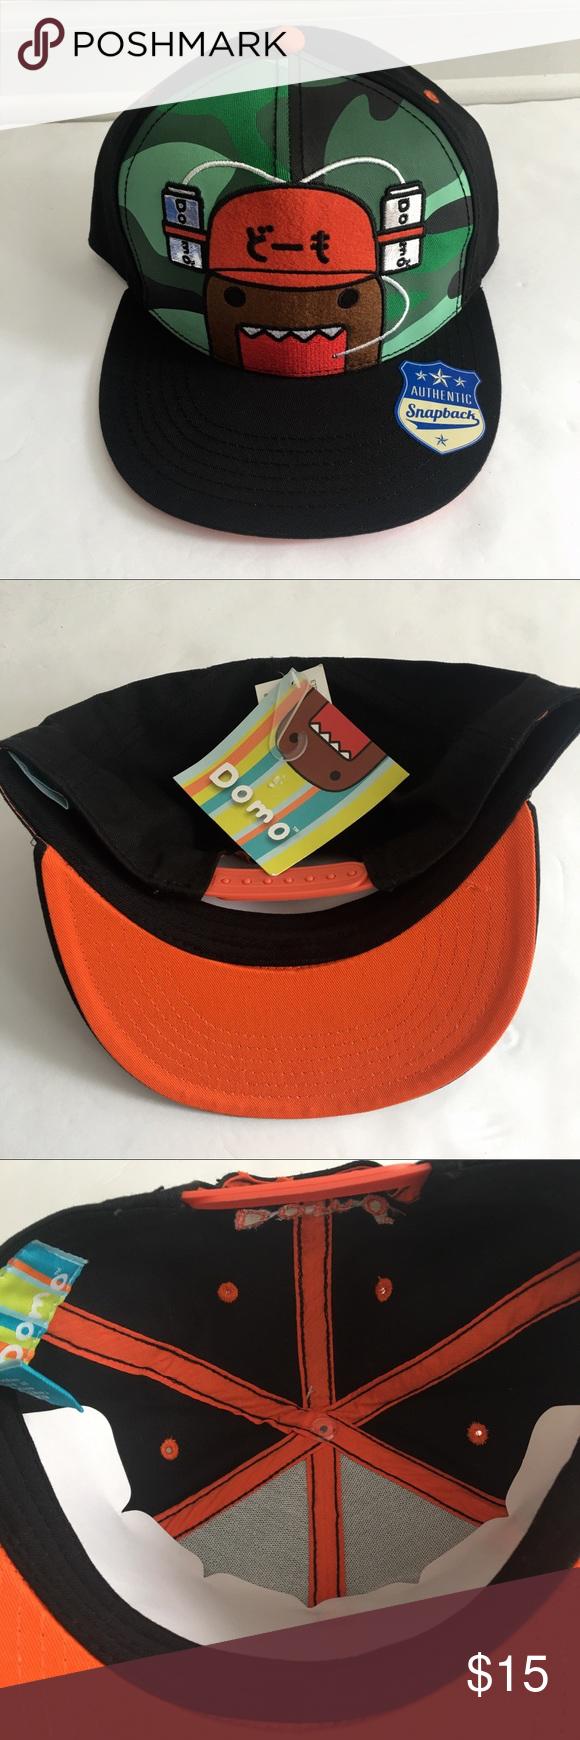 b751045b5 NWT DOMO Black SnapBack hat New DOMO Black SnapBack hat Japanese ...